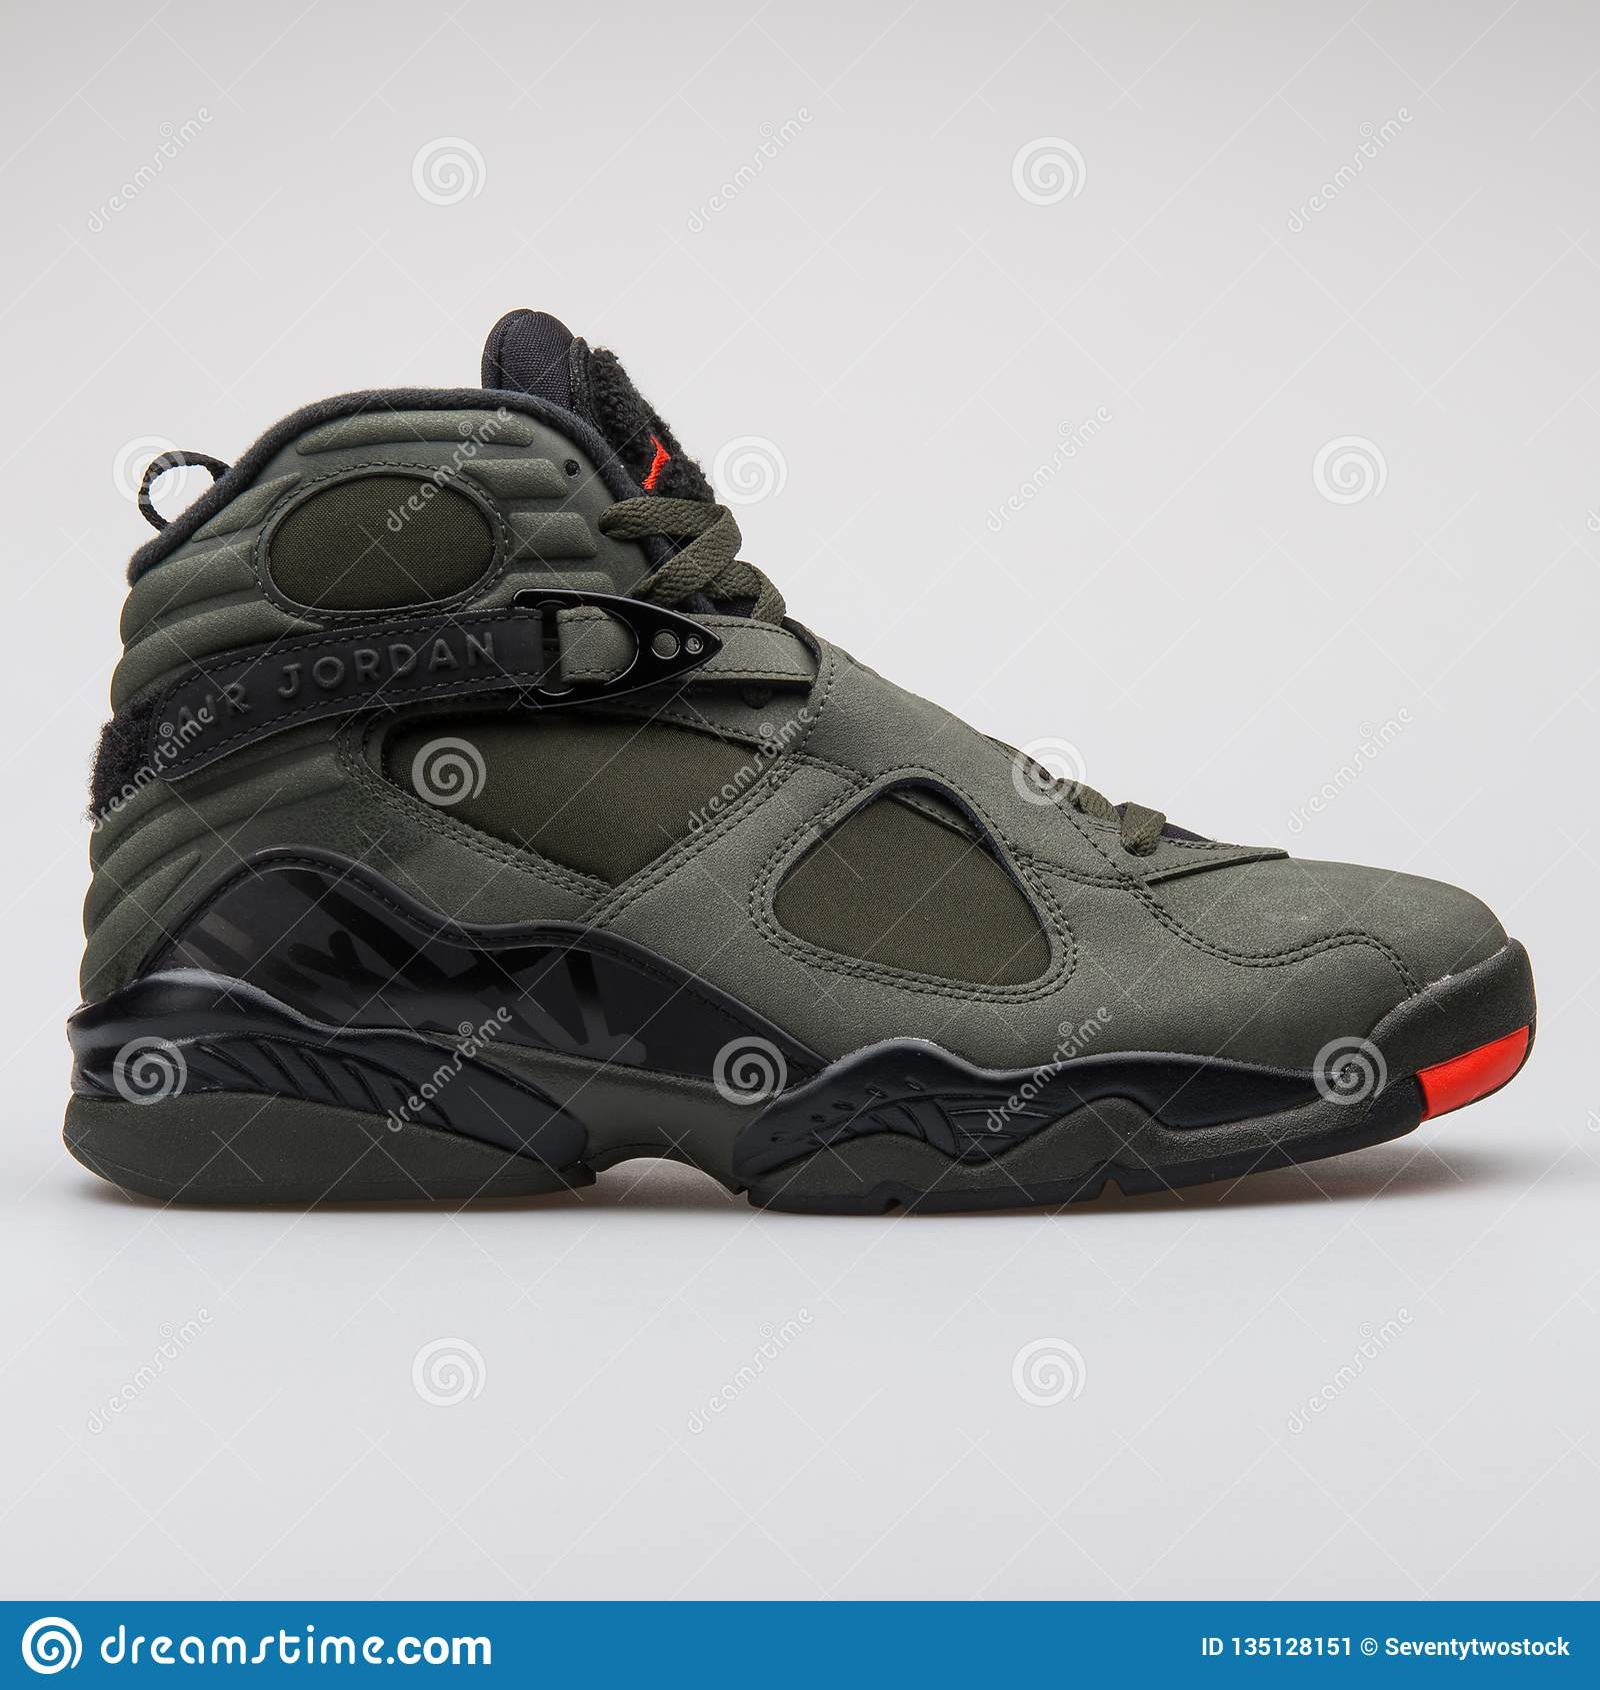 brand new a6bc6 2b8dc Nike Air Jordan 8 Retro Green, Black And Orange Sneaker ...